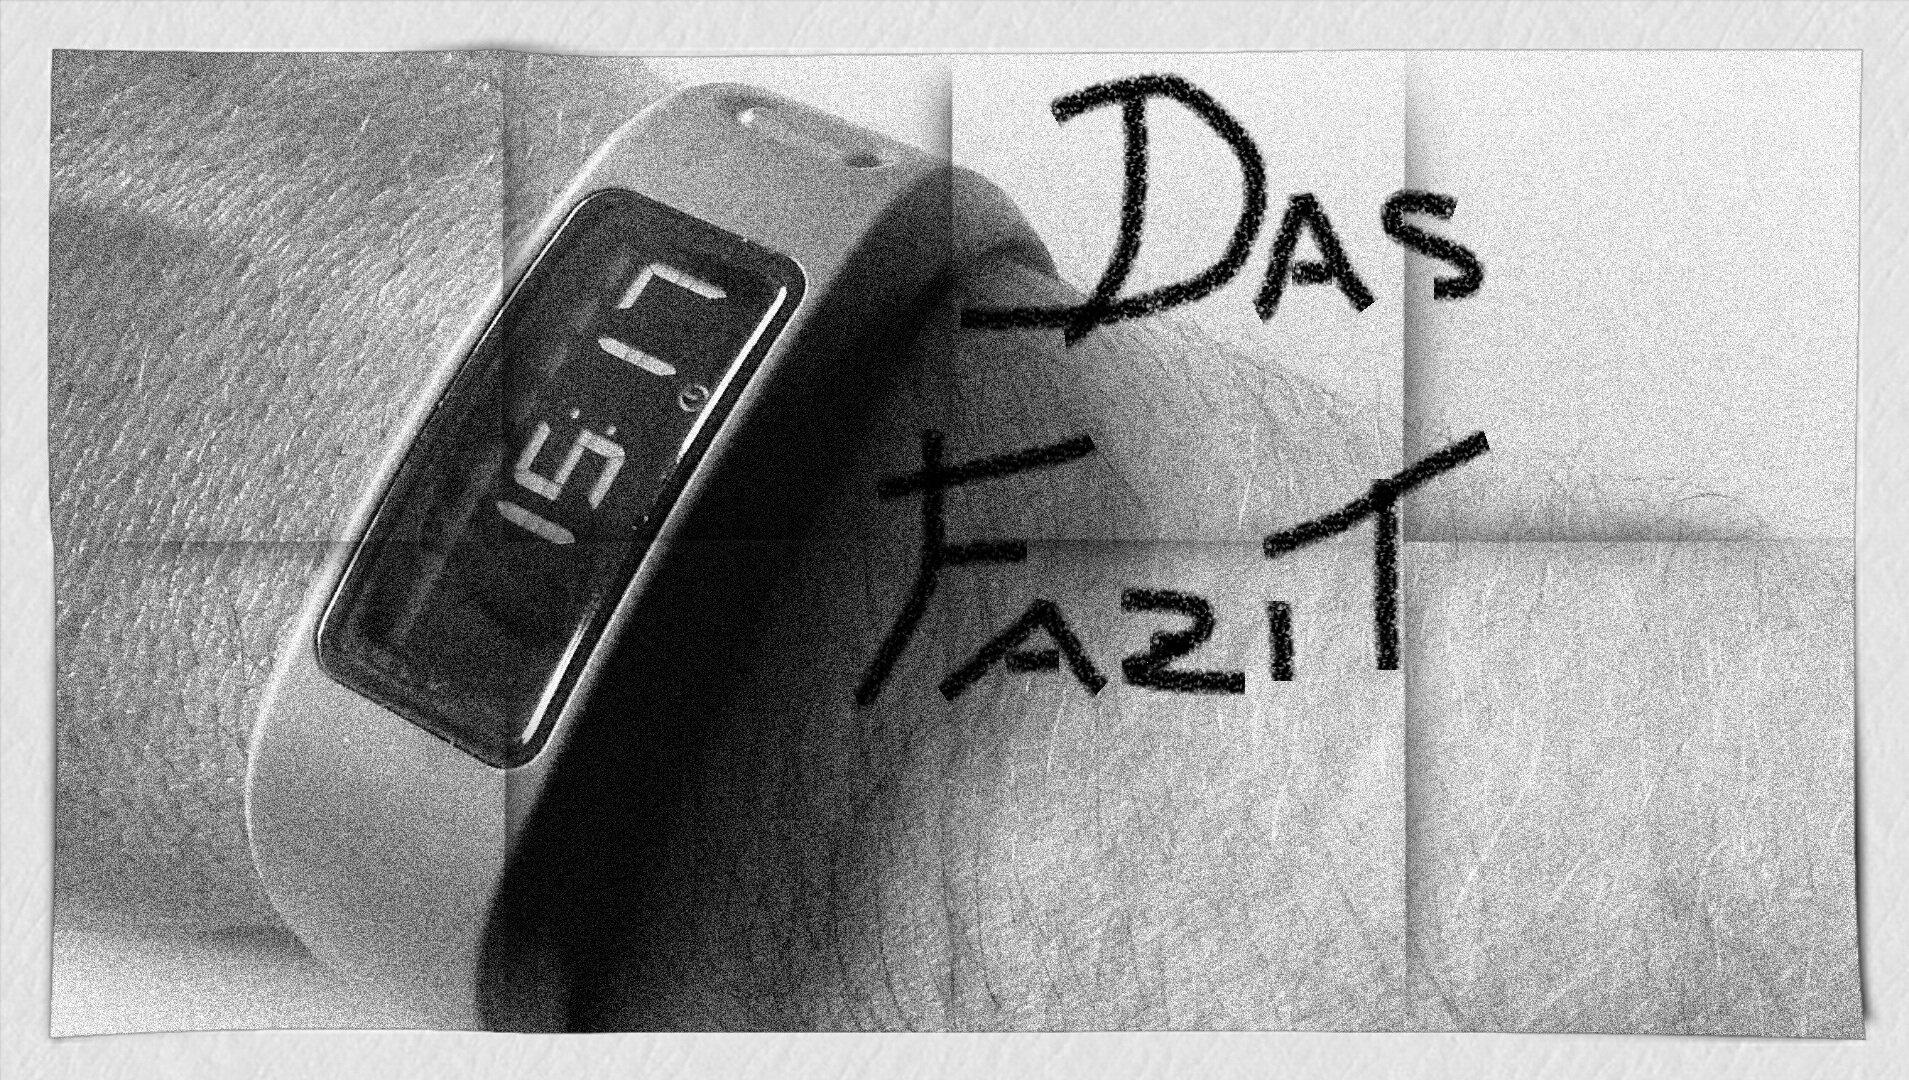 #FIDS mit dem Garmin Vivofit – DAS FAZIT